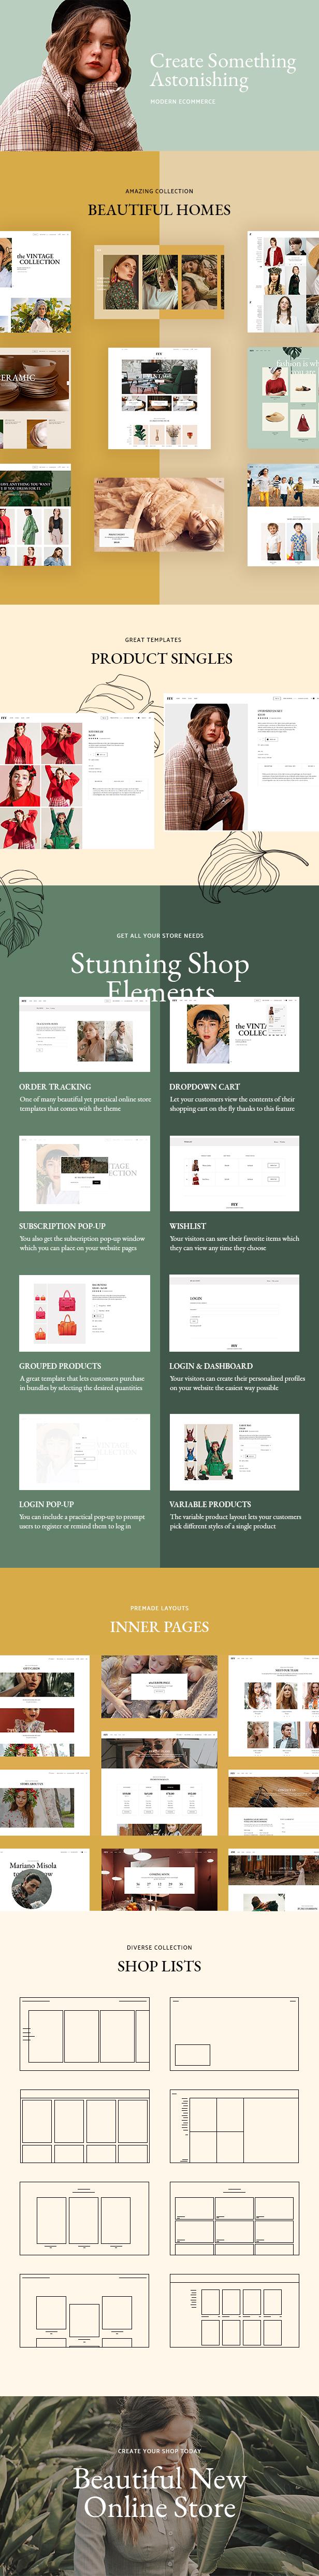 Fey - Modern eCommerce Theme - 1